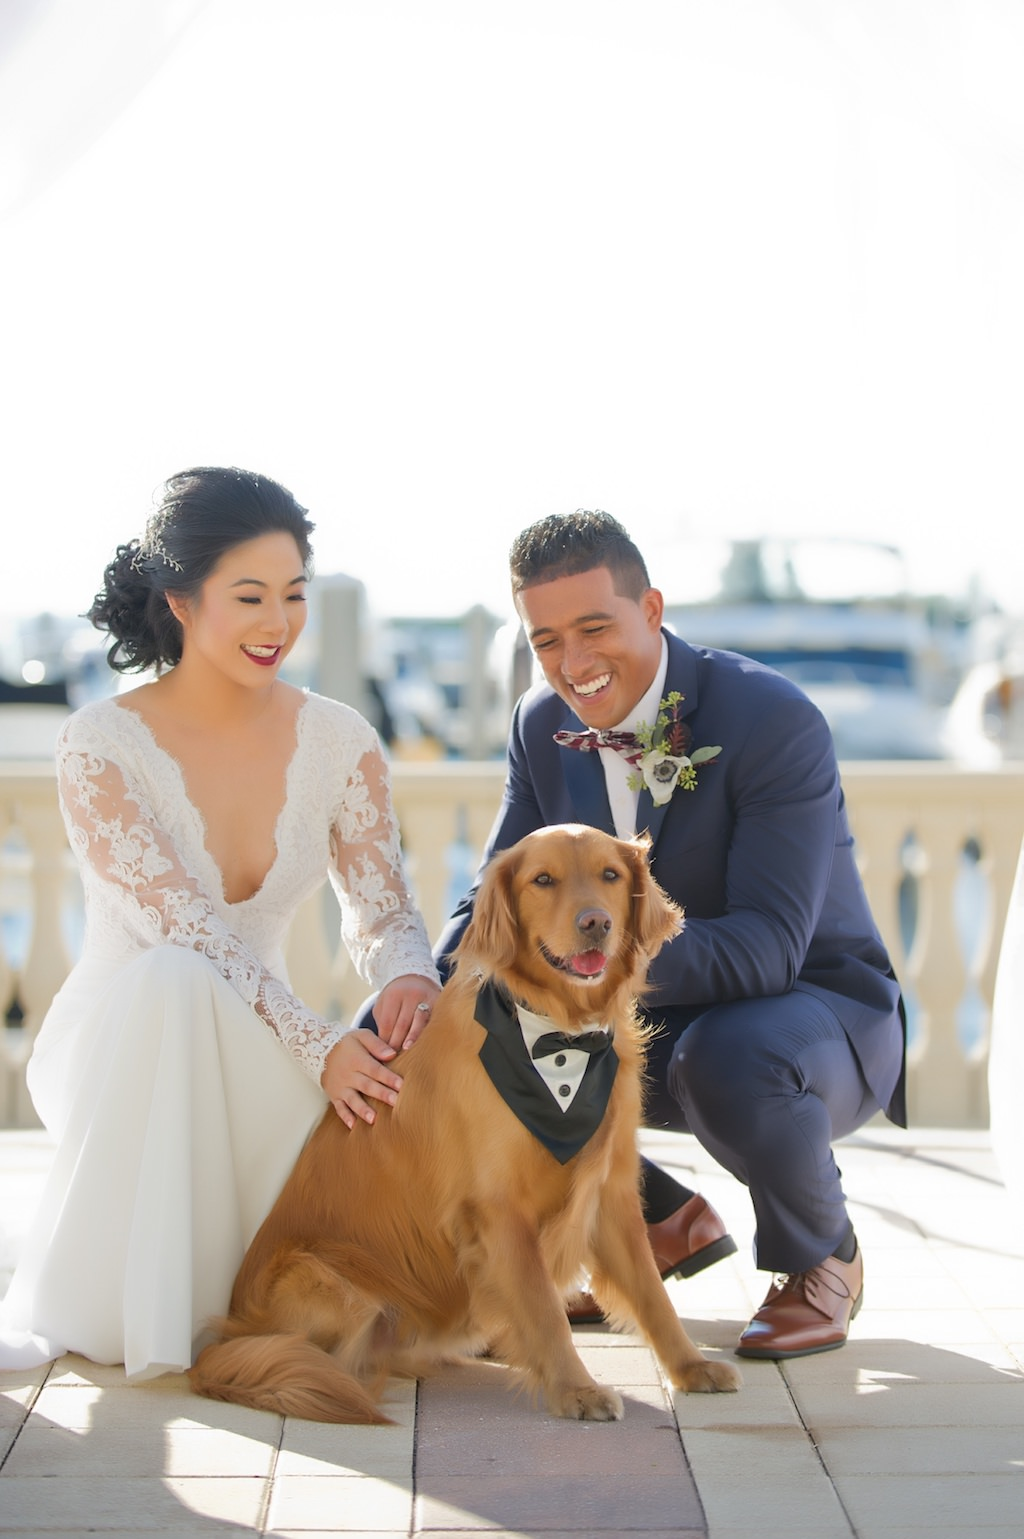 Wedding Ceremony Bride and Groom with Dog Portrait | Tampa Bay Wedding Photographer Andi Diamond Photography | Tampa Wedding Pet Coordinators Fairy Tail Pet Care